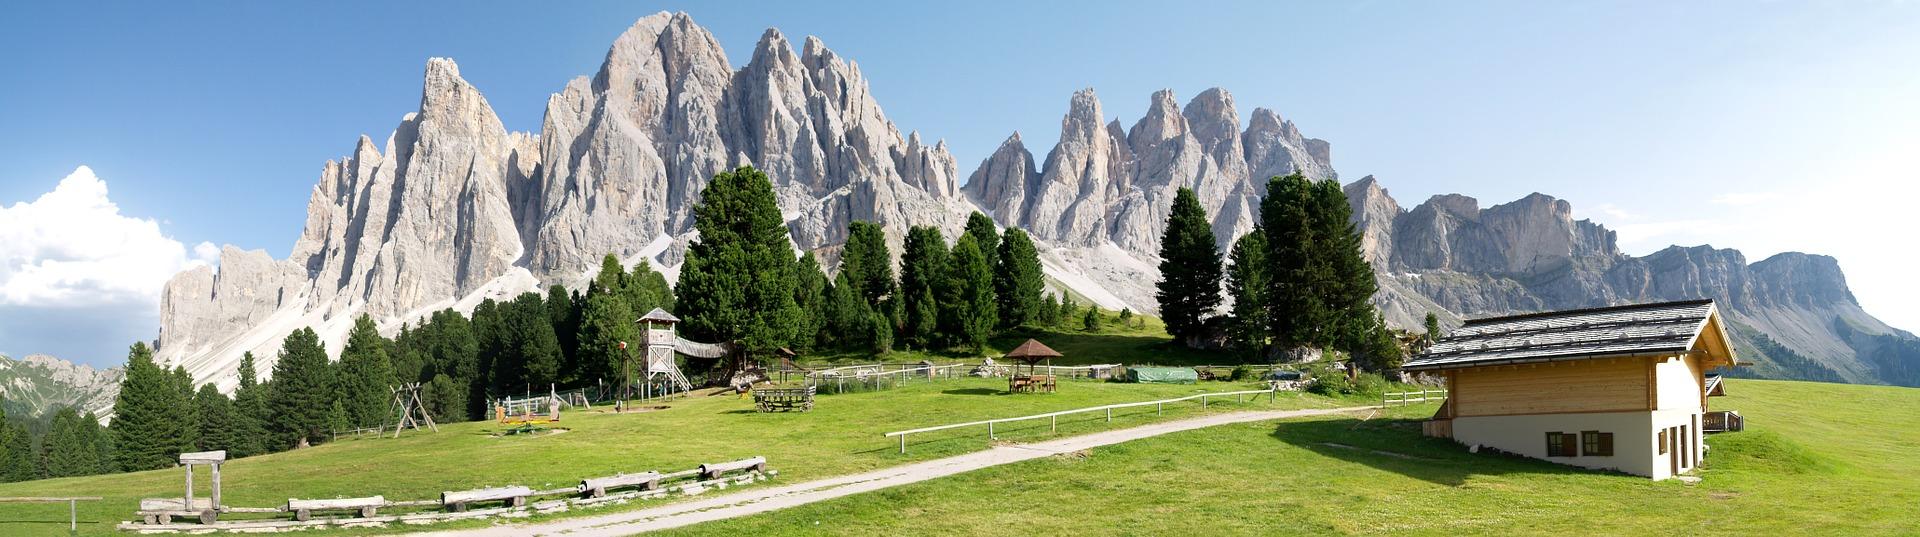 South Tyrol - Dolomiti Mountains 2